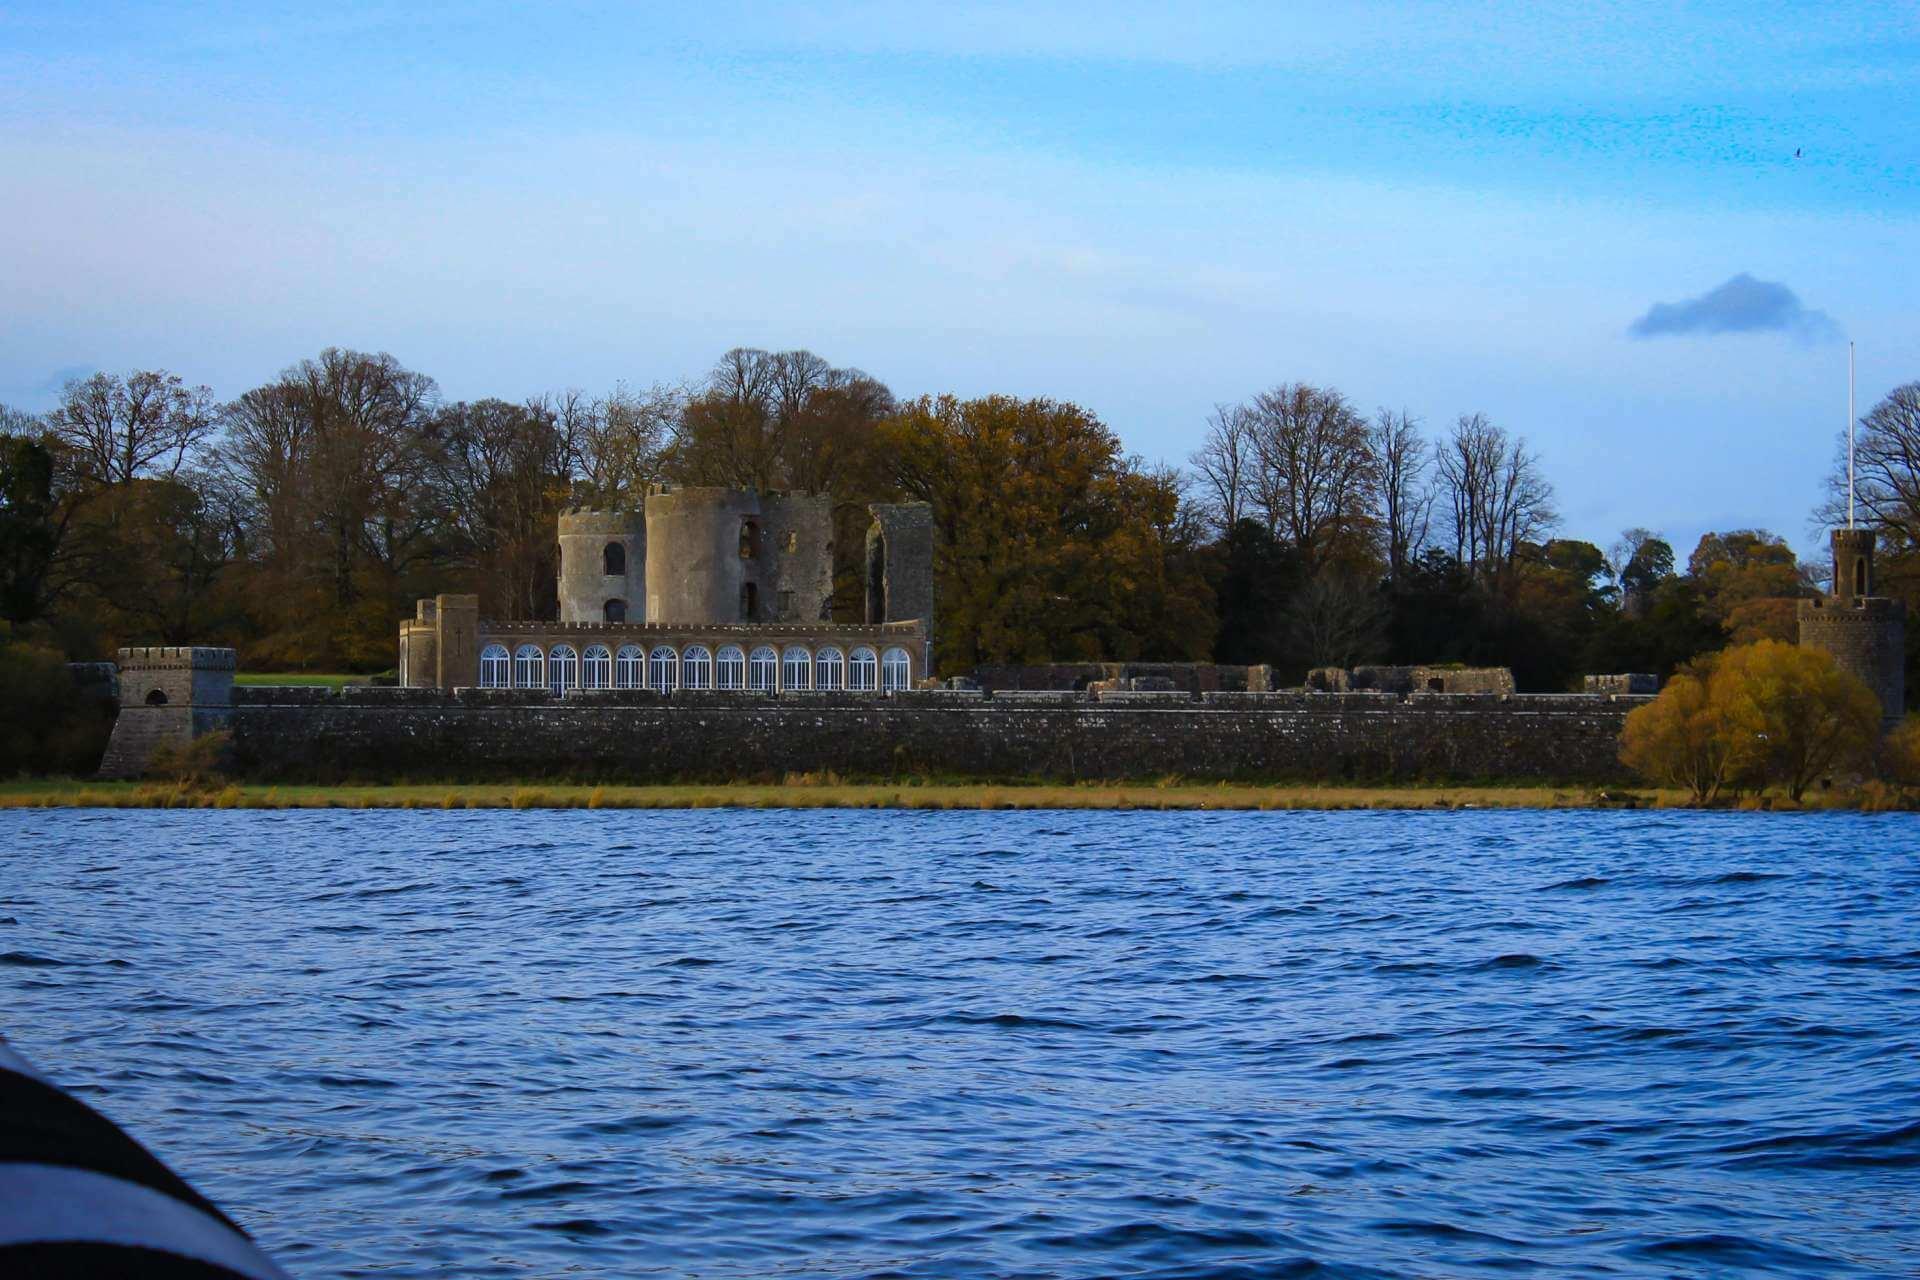 Shane's Castle Lough Neagh